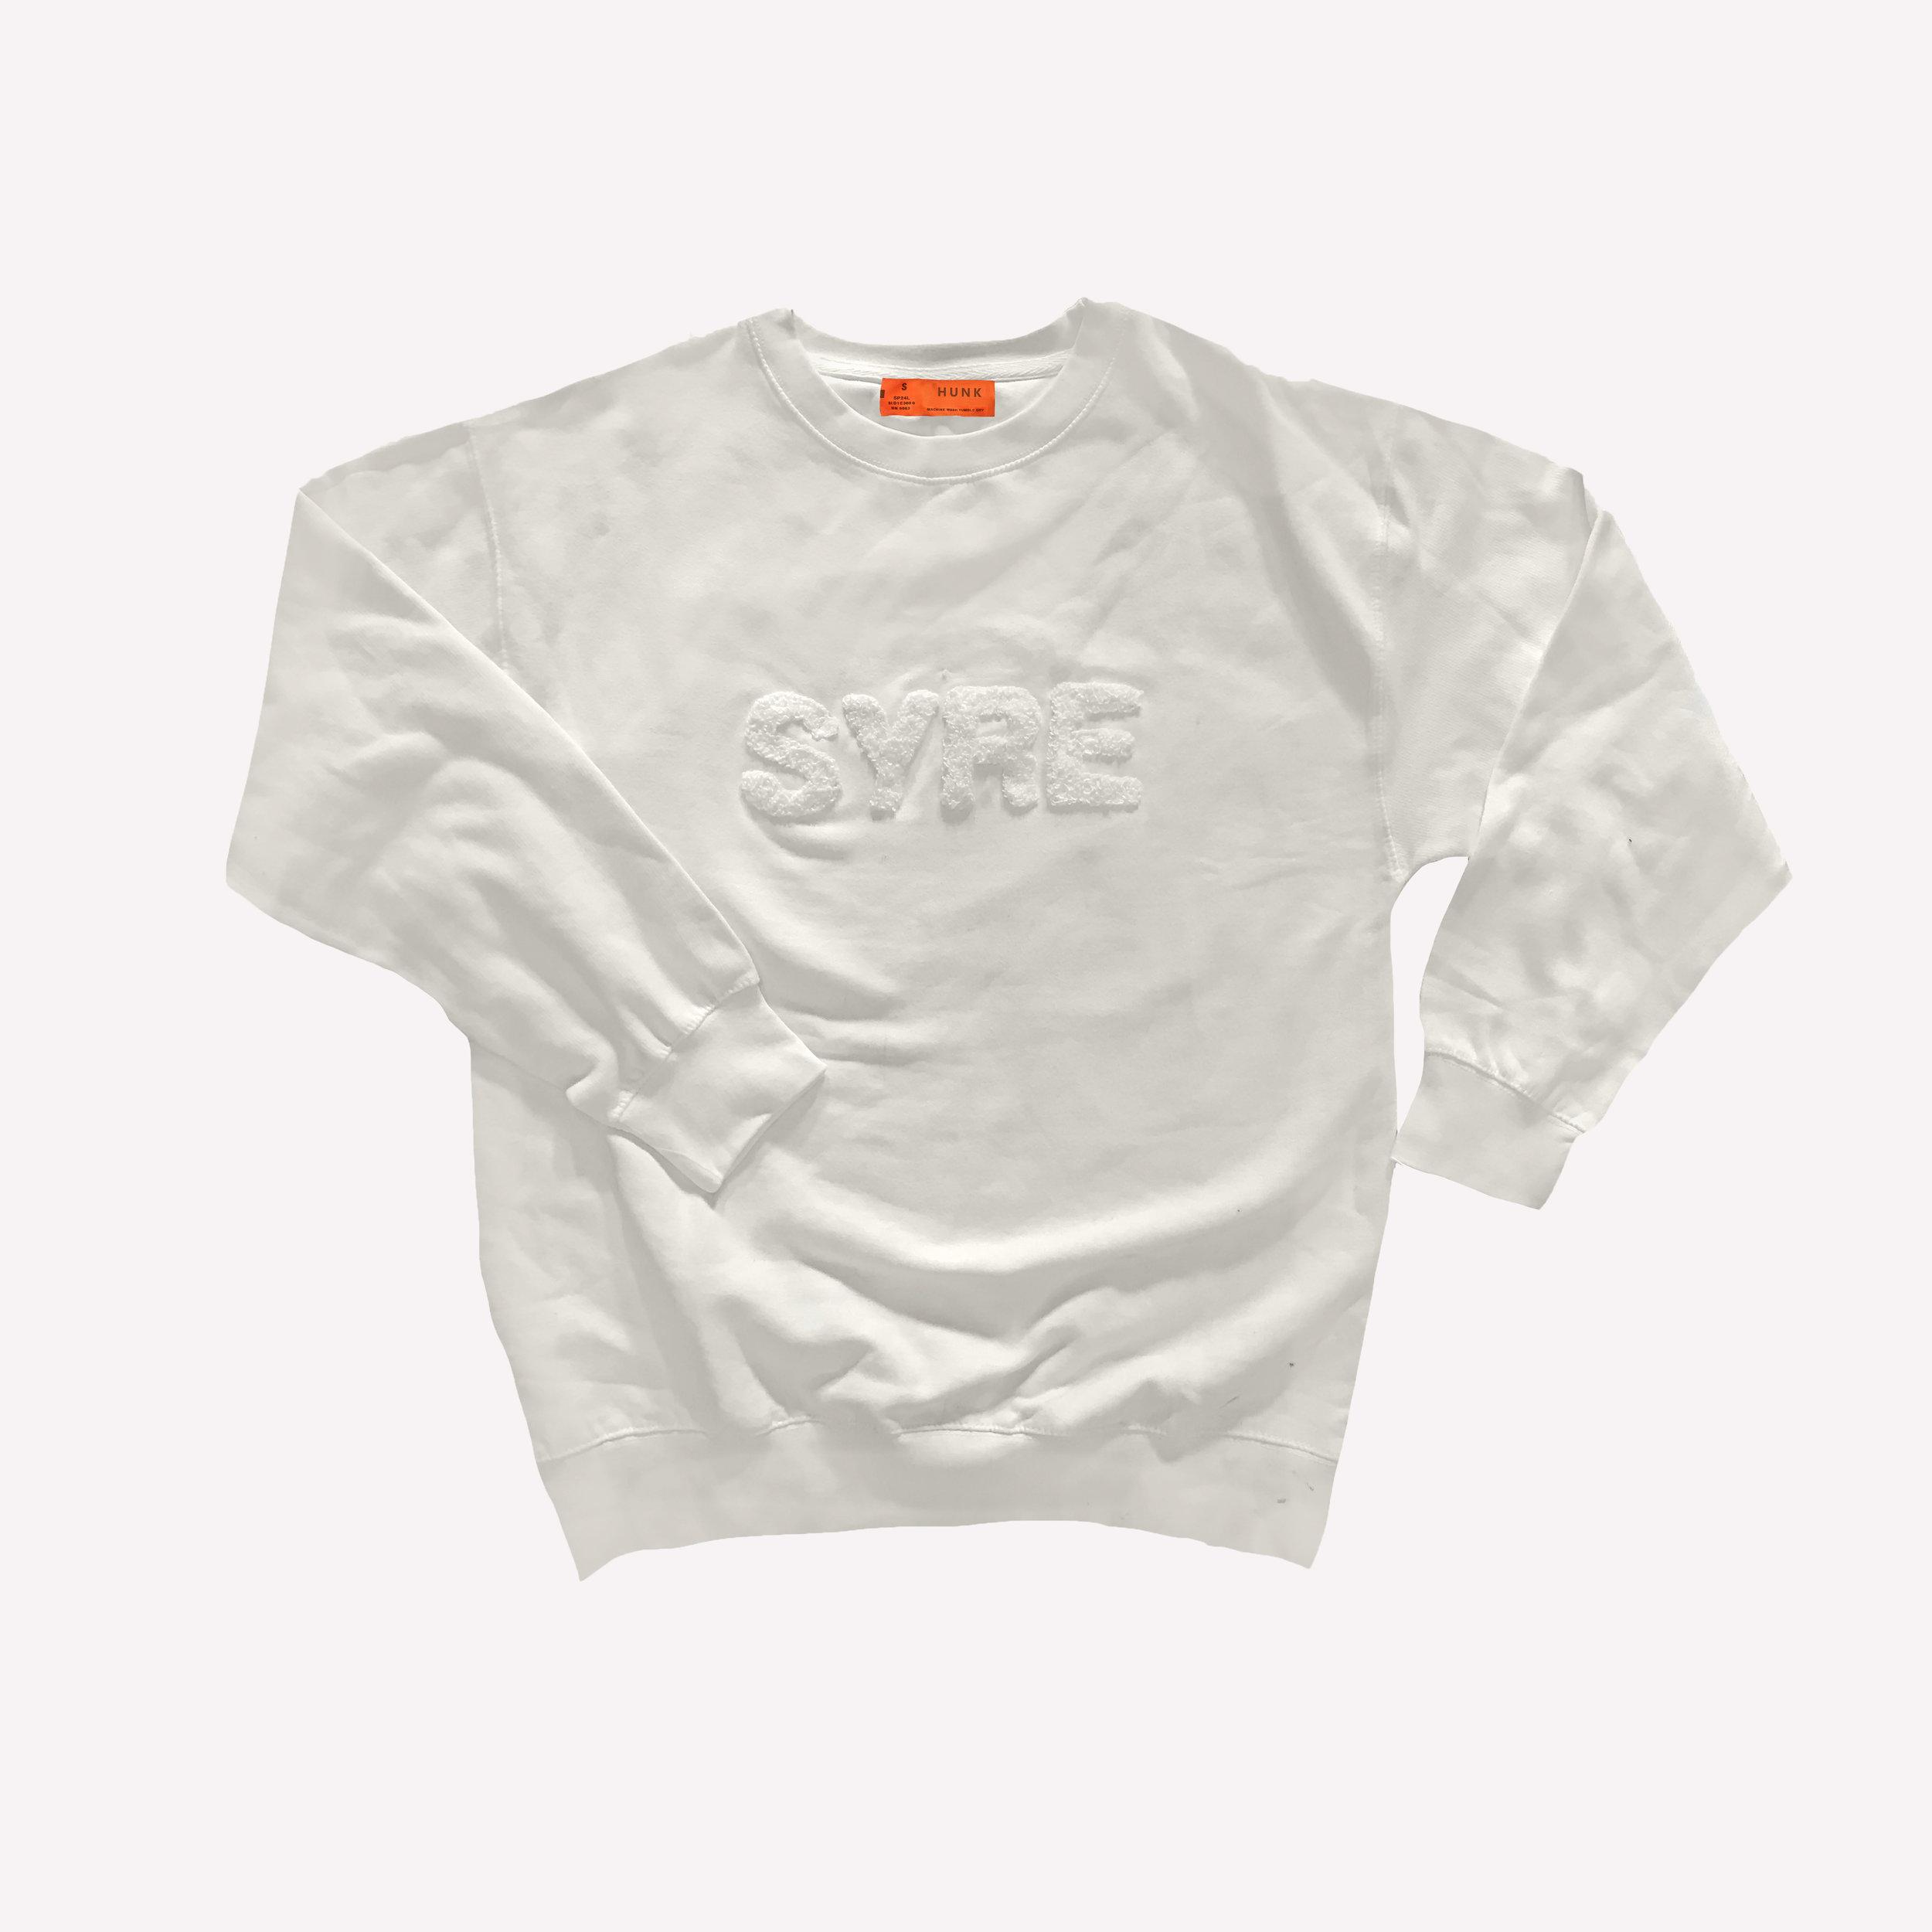 White on White Syre Front copy 100.jpg